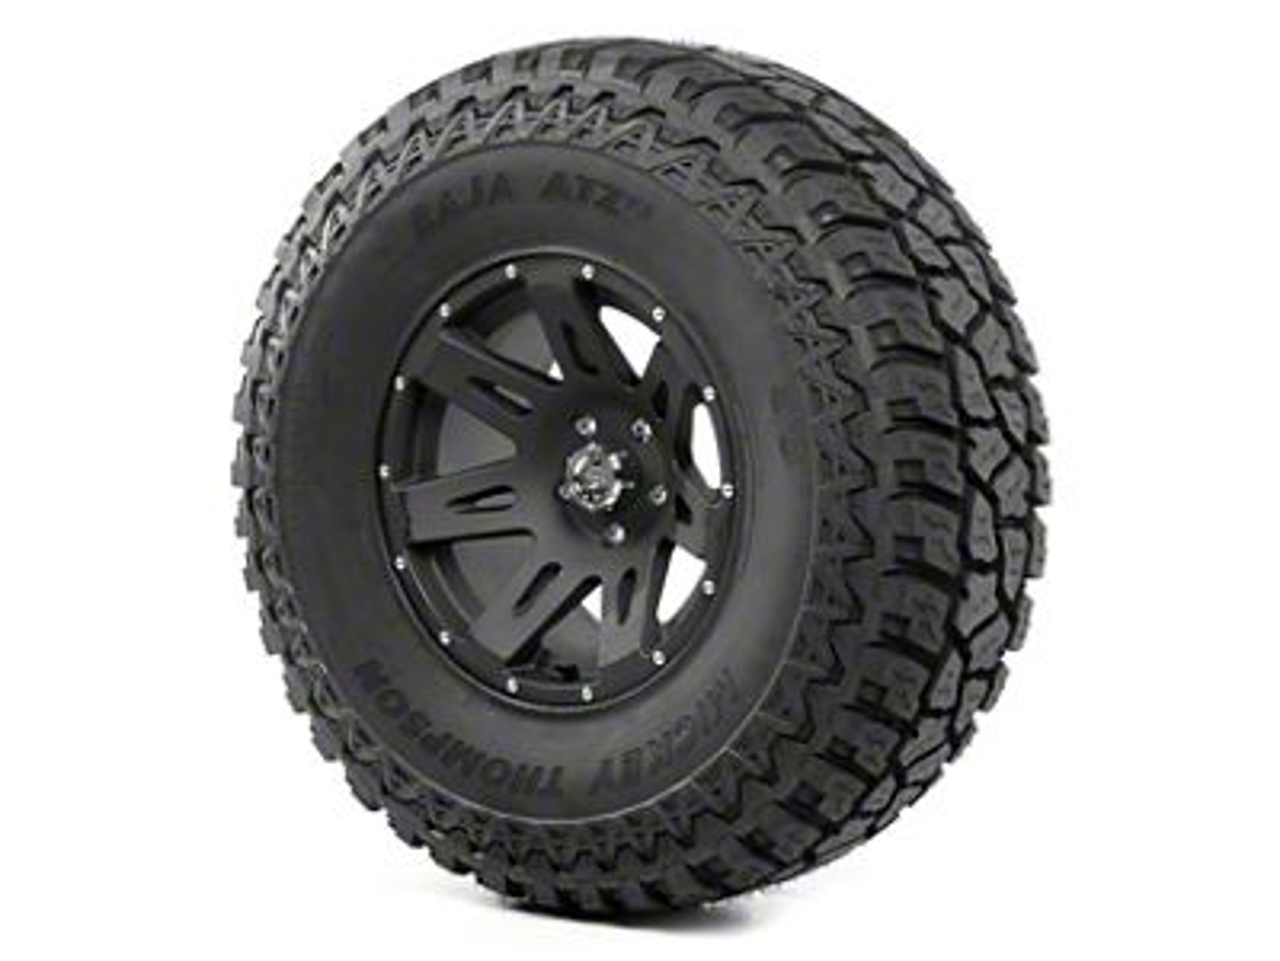 Rugged Ridge XHD Wheel 17x9 Black Satin and Mickey Thompson ATZ P3 37x12.50x17 Tire Kit (13-18 Jeep Wrangler JK; 2018 Jeep Wrangler JL)